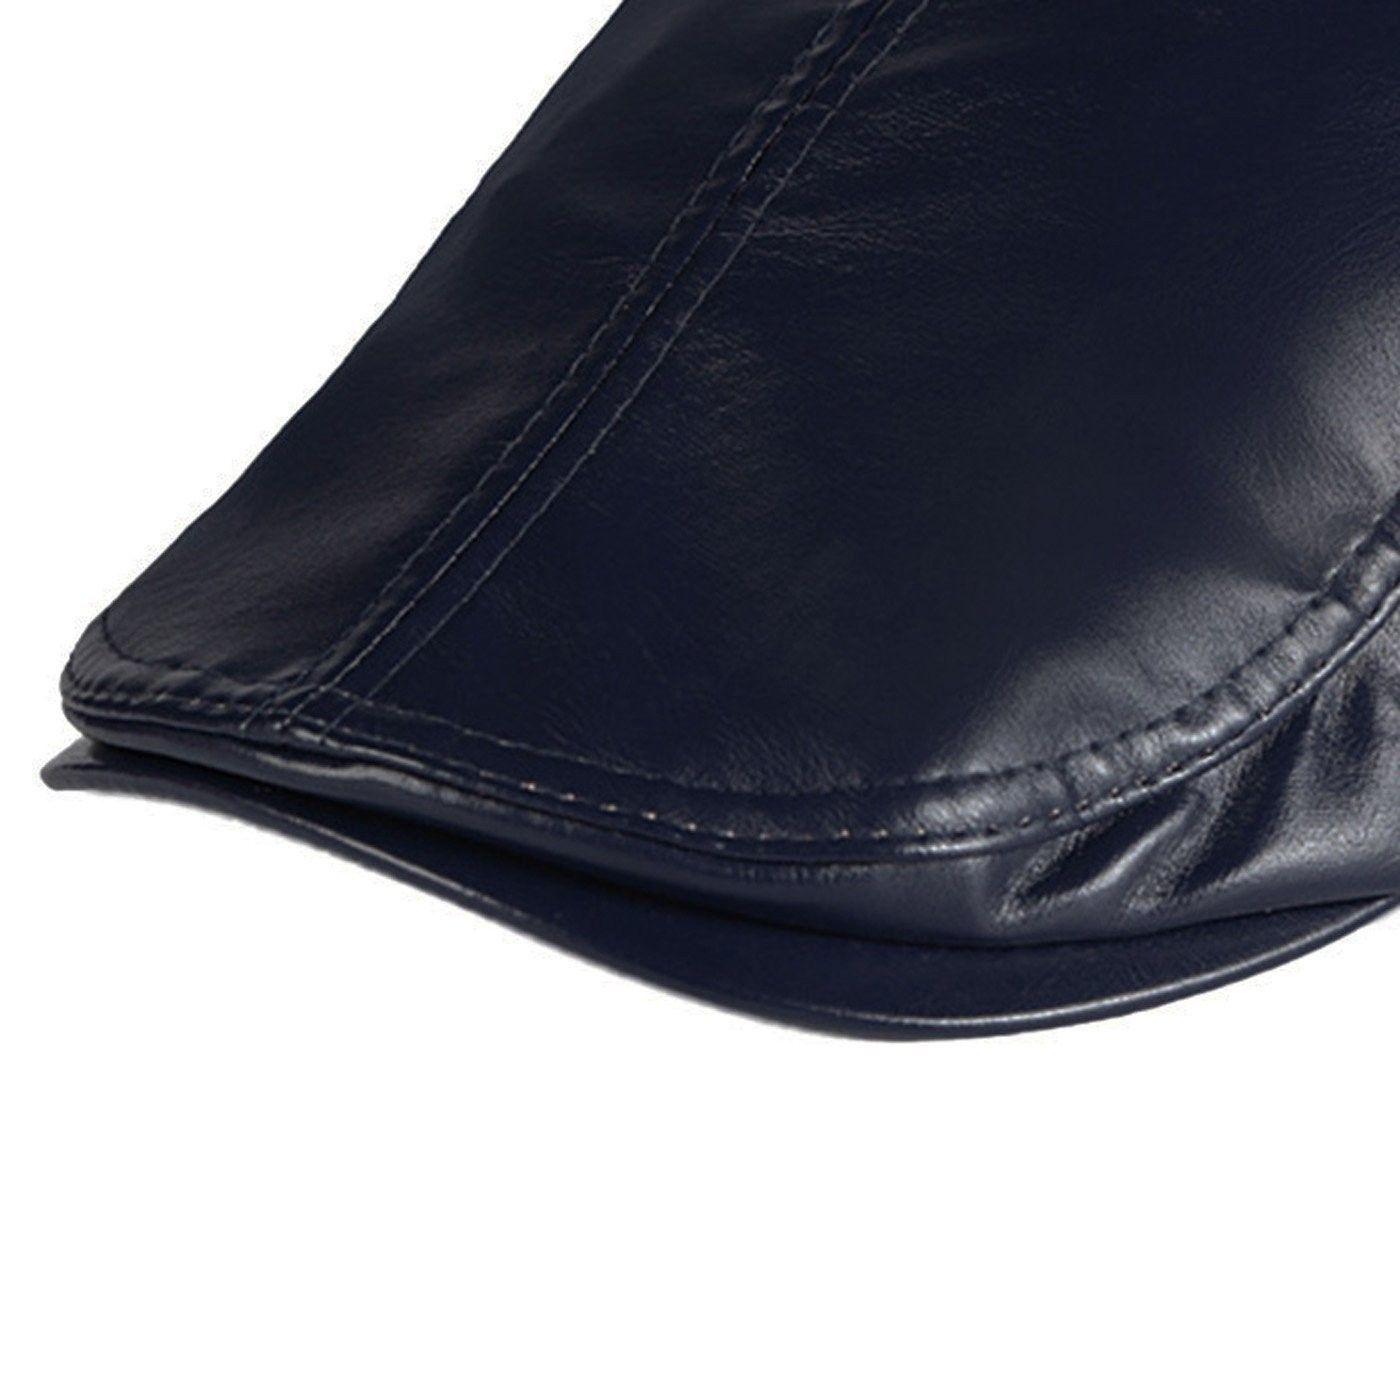 e4455d9baca Men PU Leather Duckbill Cap Vintage Ivy Newsboy Cap Flat Cap Cabby Hat -  Blue -